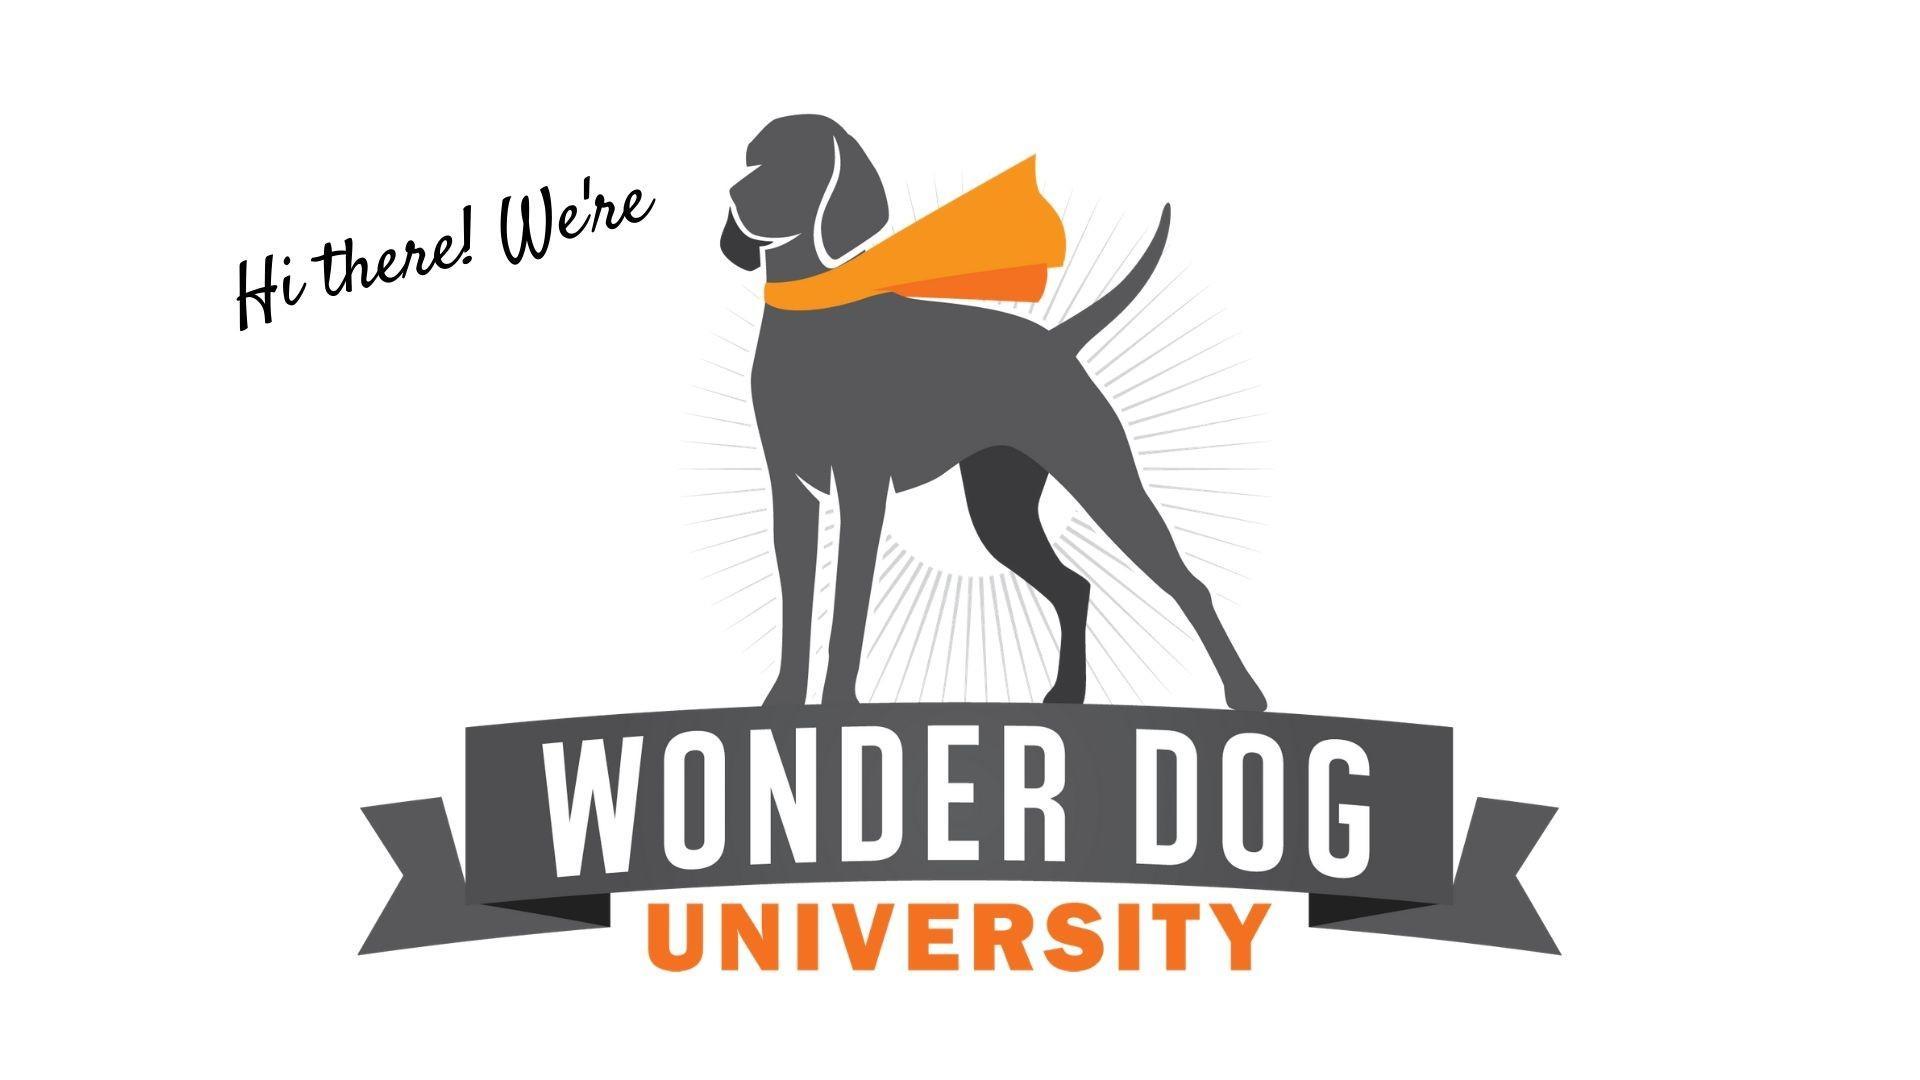 Wonder Dog University